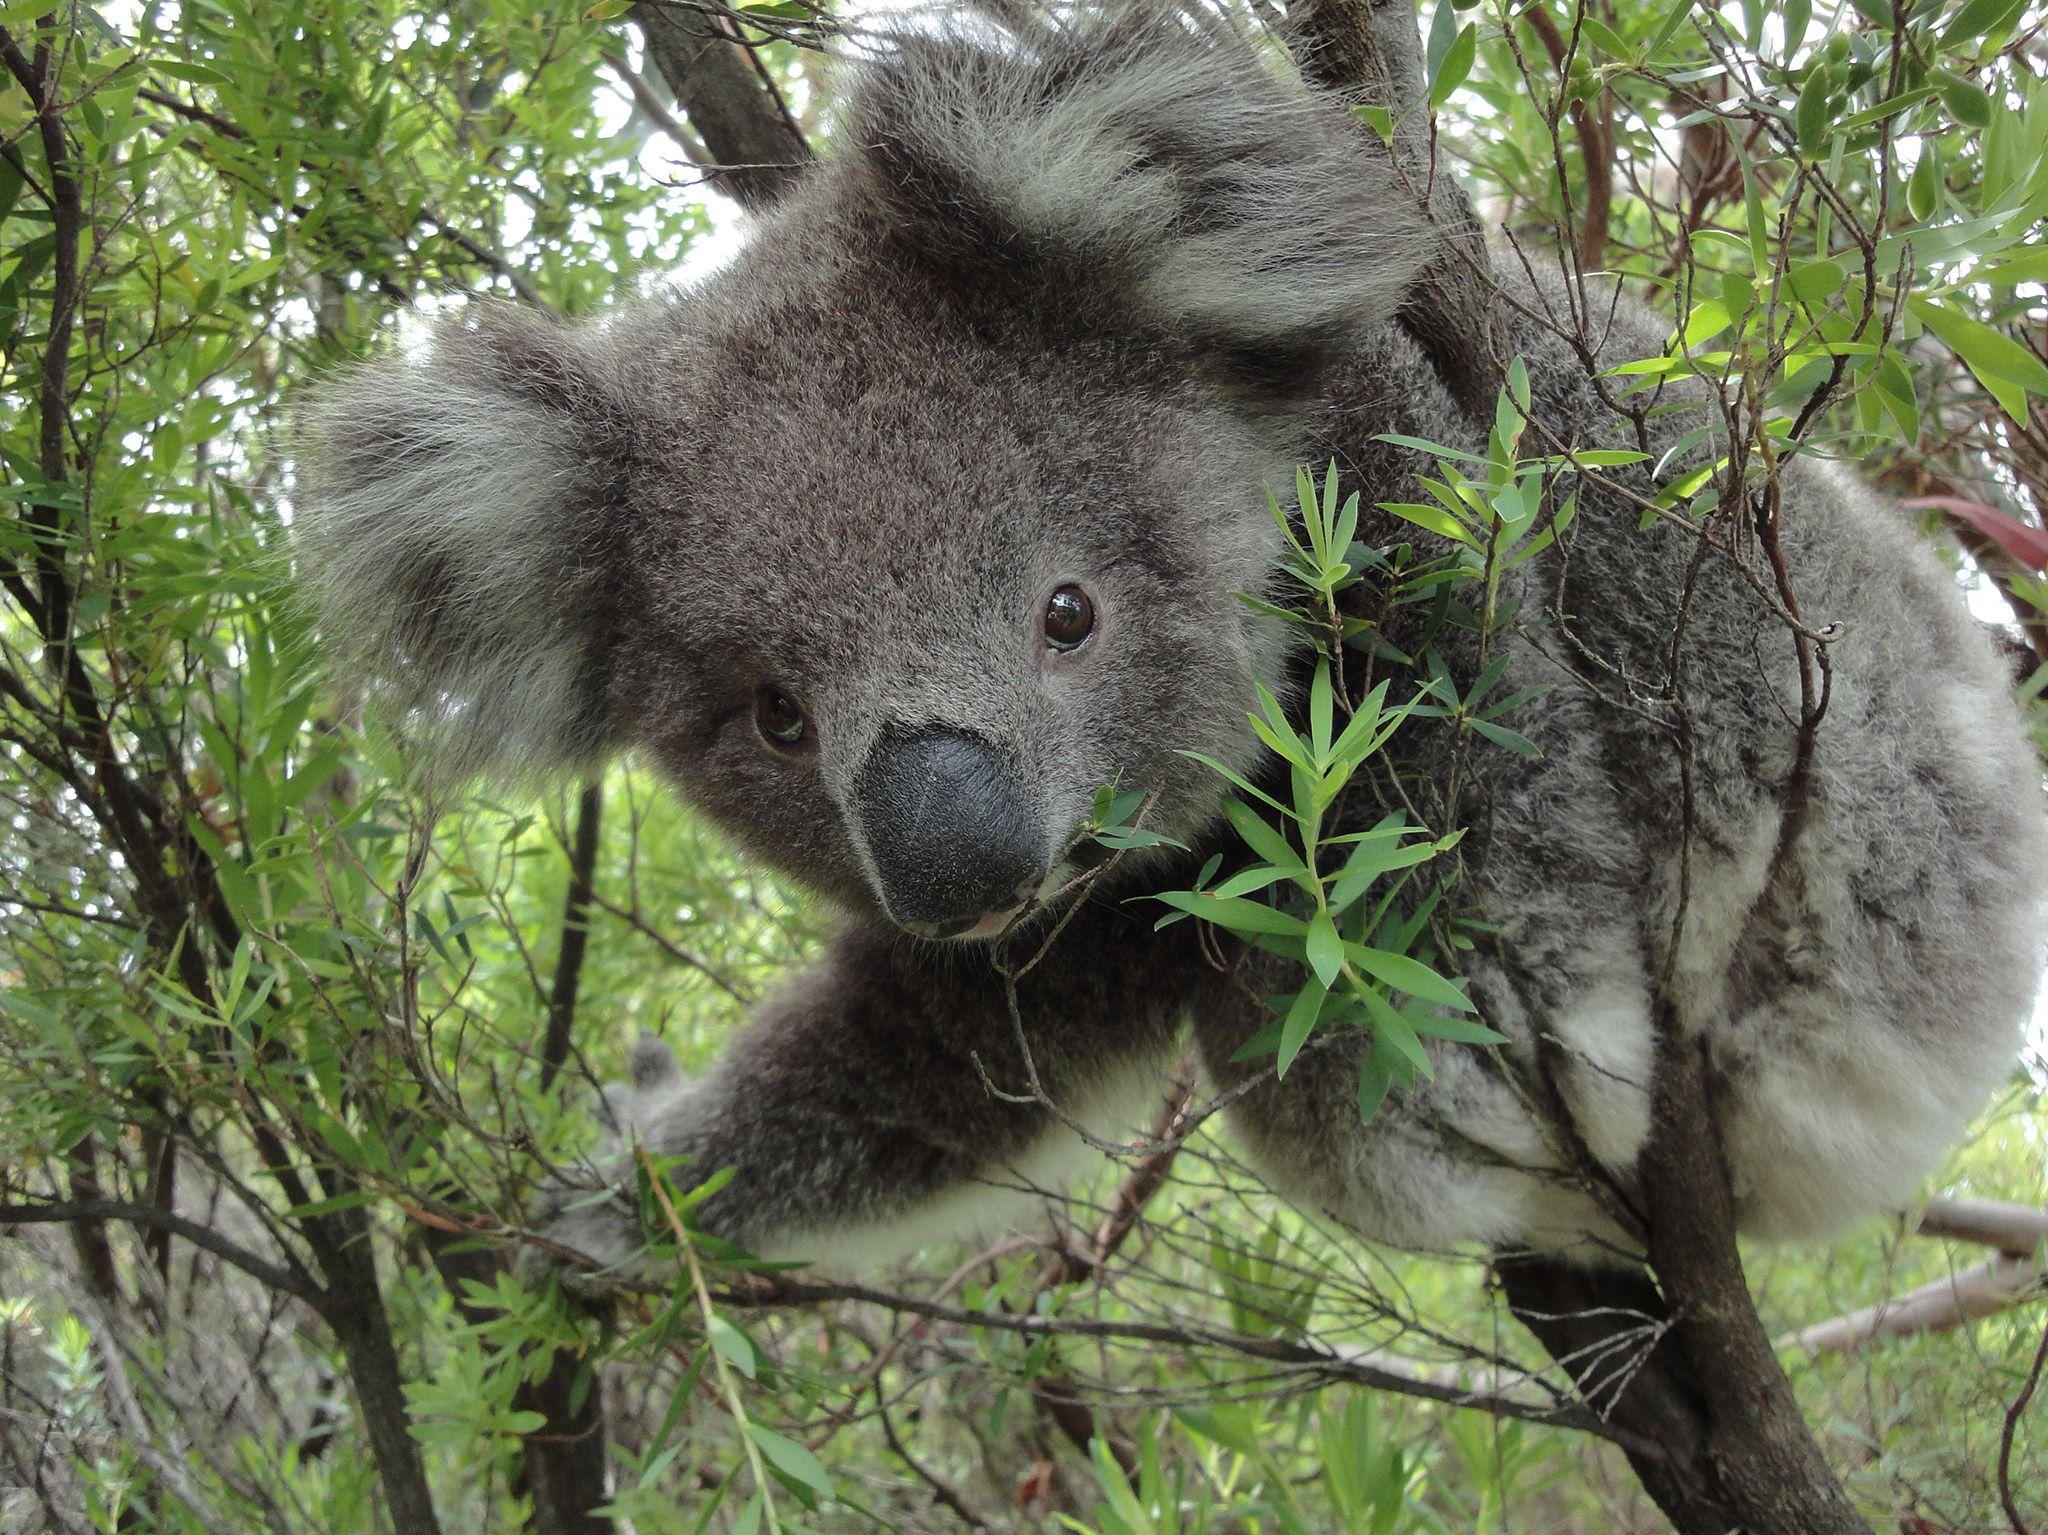 Koala on Wild Australia. This is part of Wild Australia: Will To Survive [Photo of the day - June 2021]